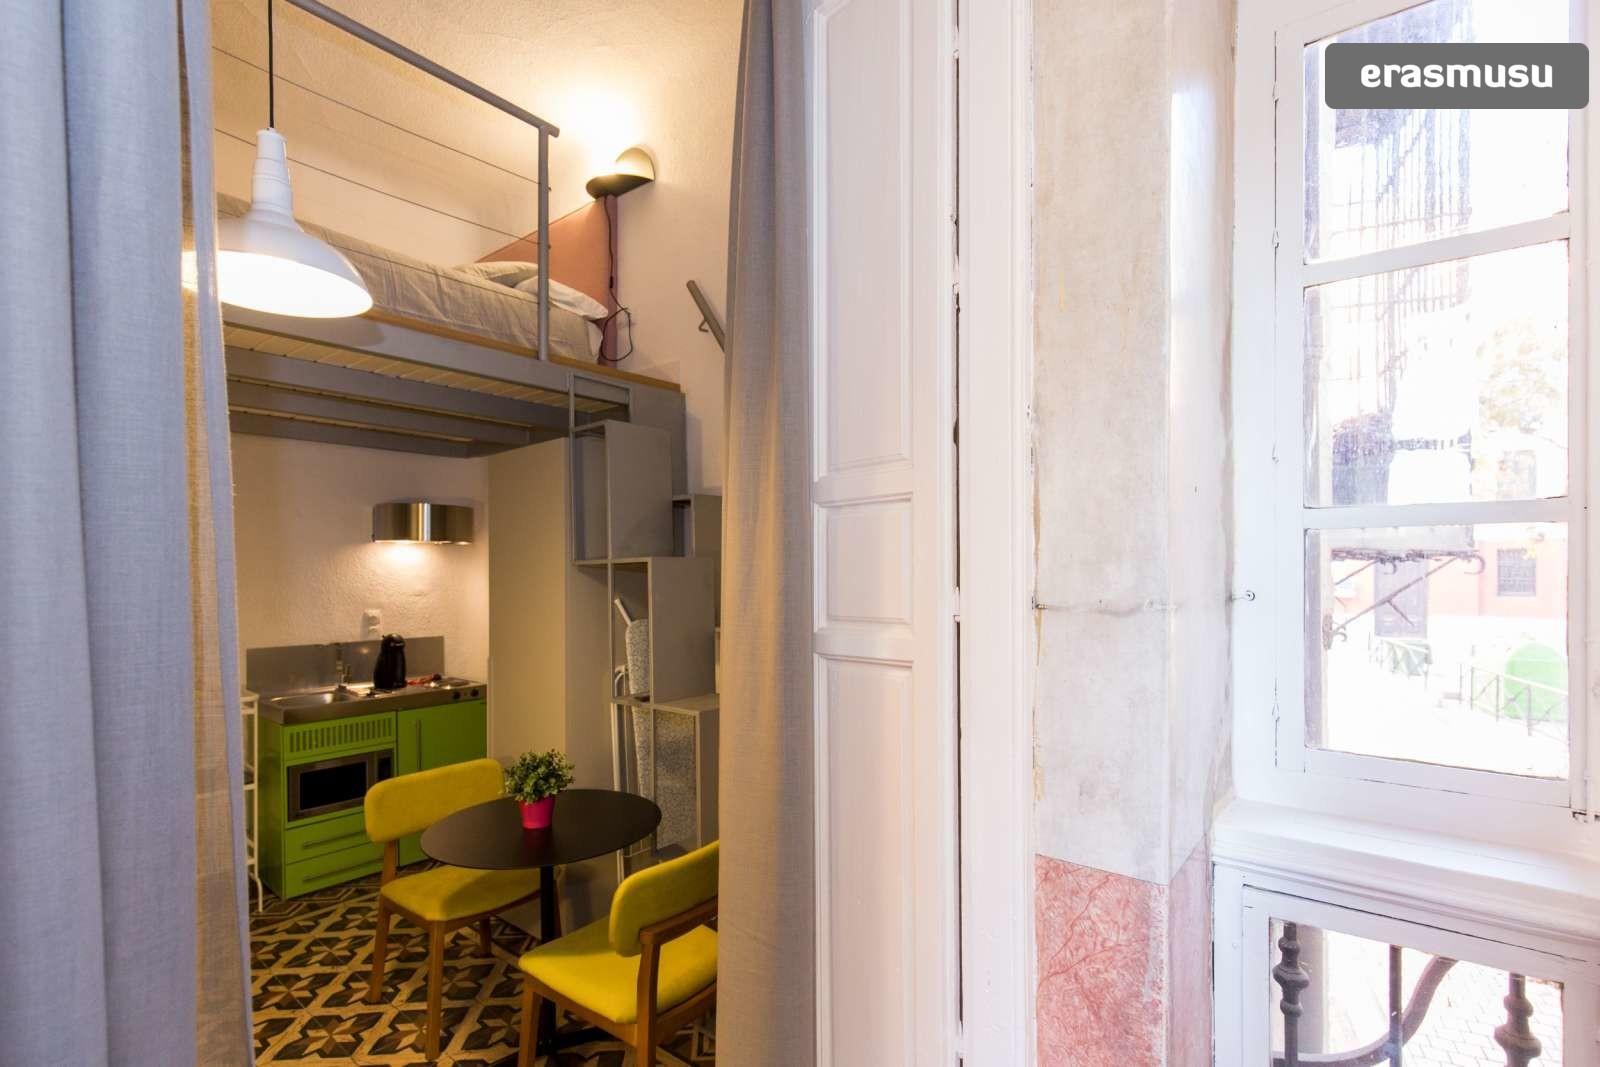 colourful-studio-apartment-rent-city-centre-1eb2a651f55cbd47a1a7